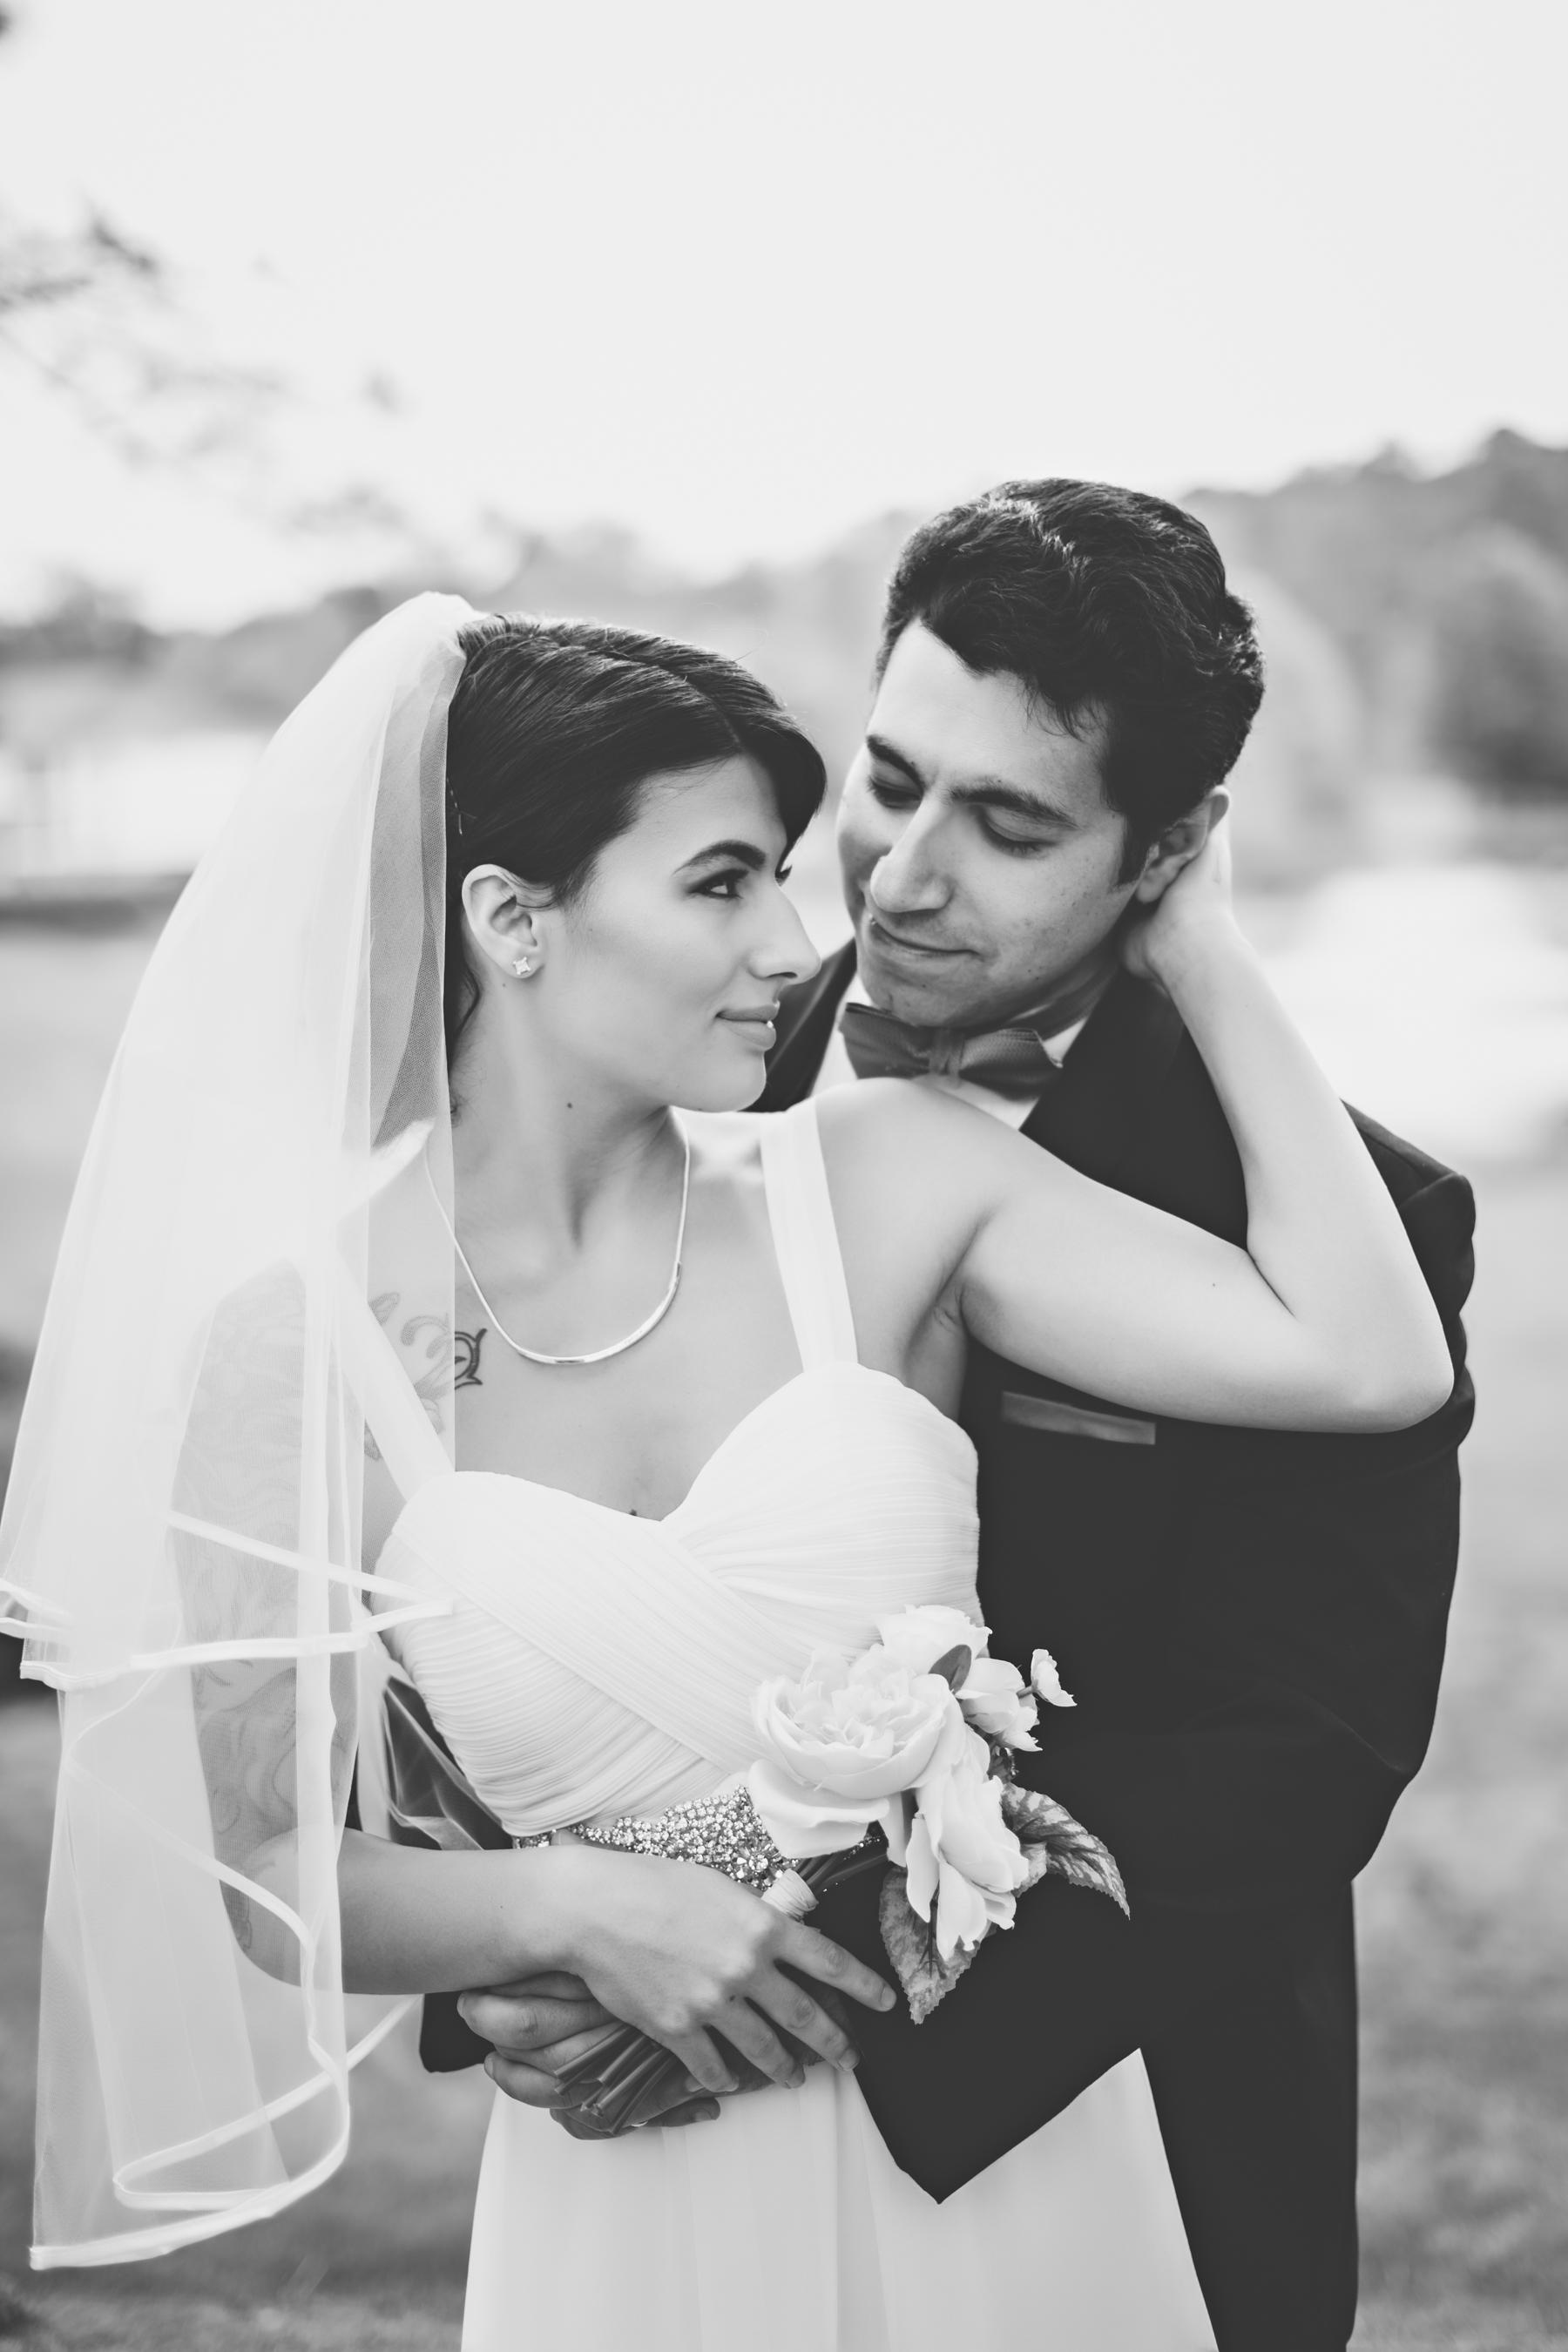 Bridal-93-Edit.jpg